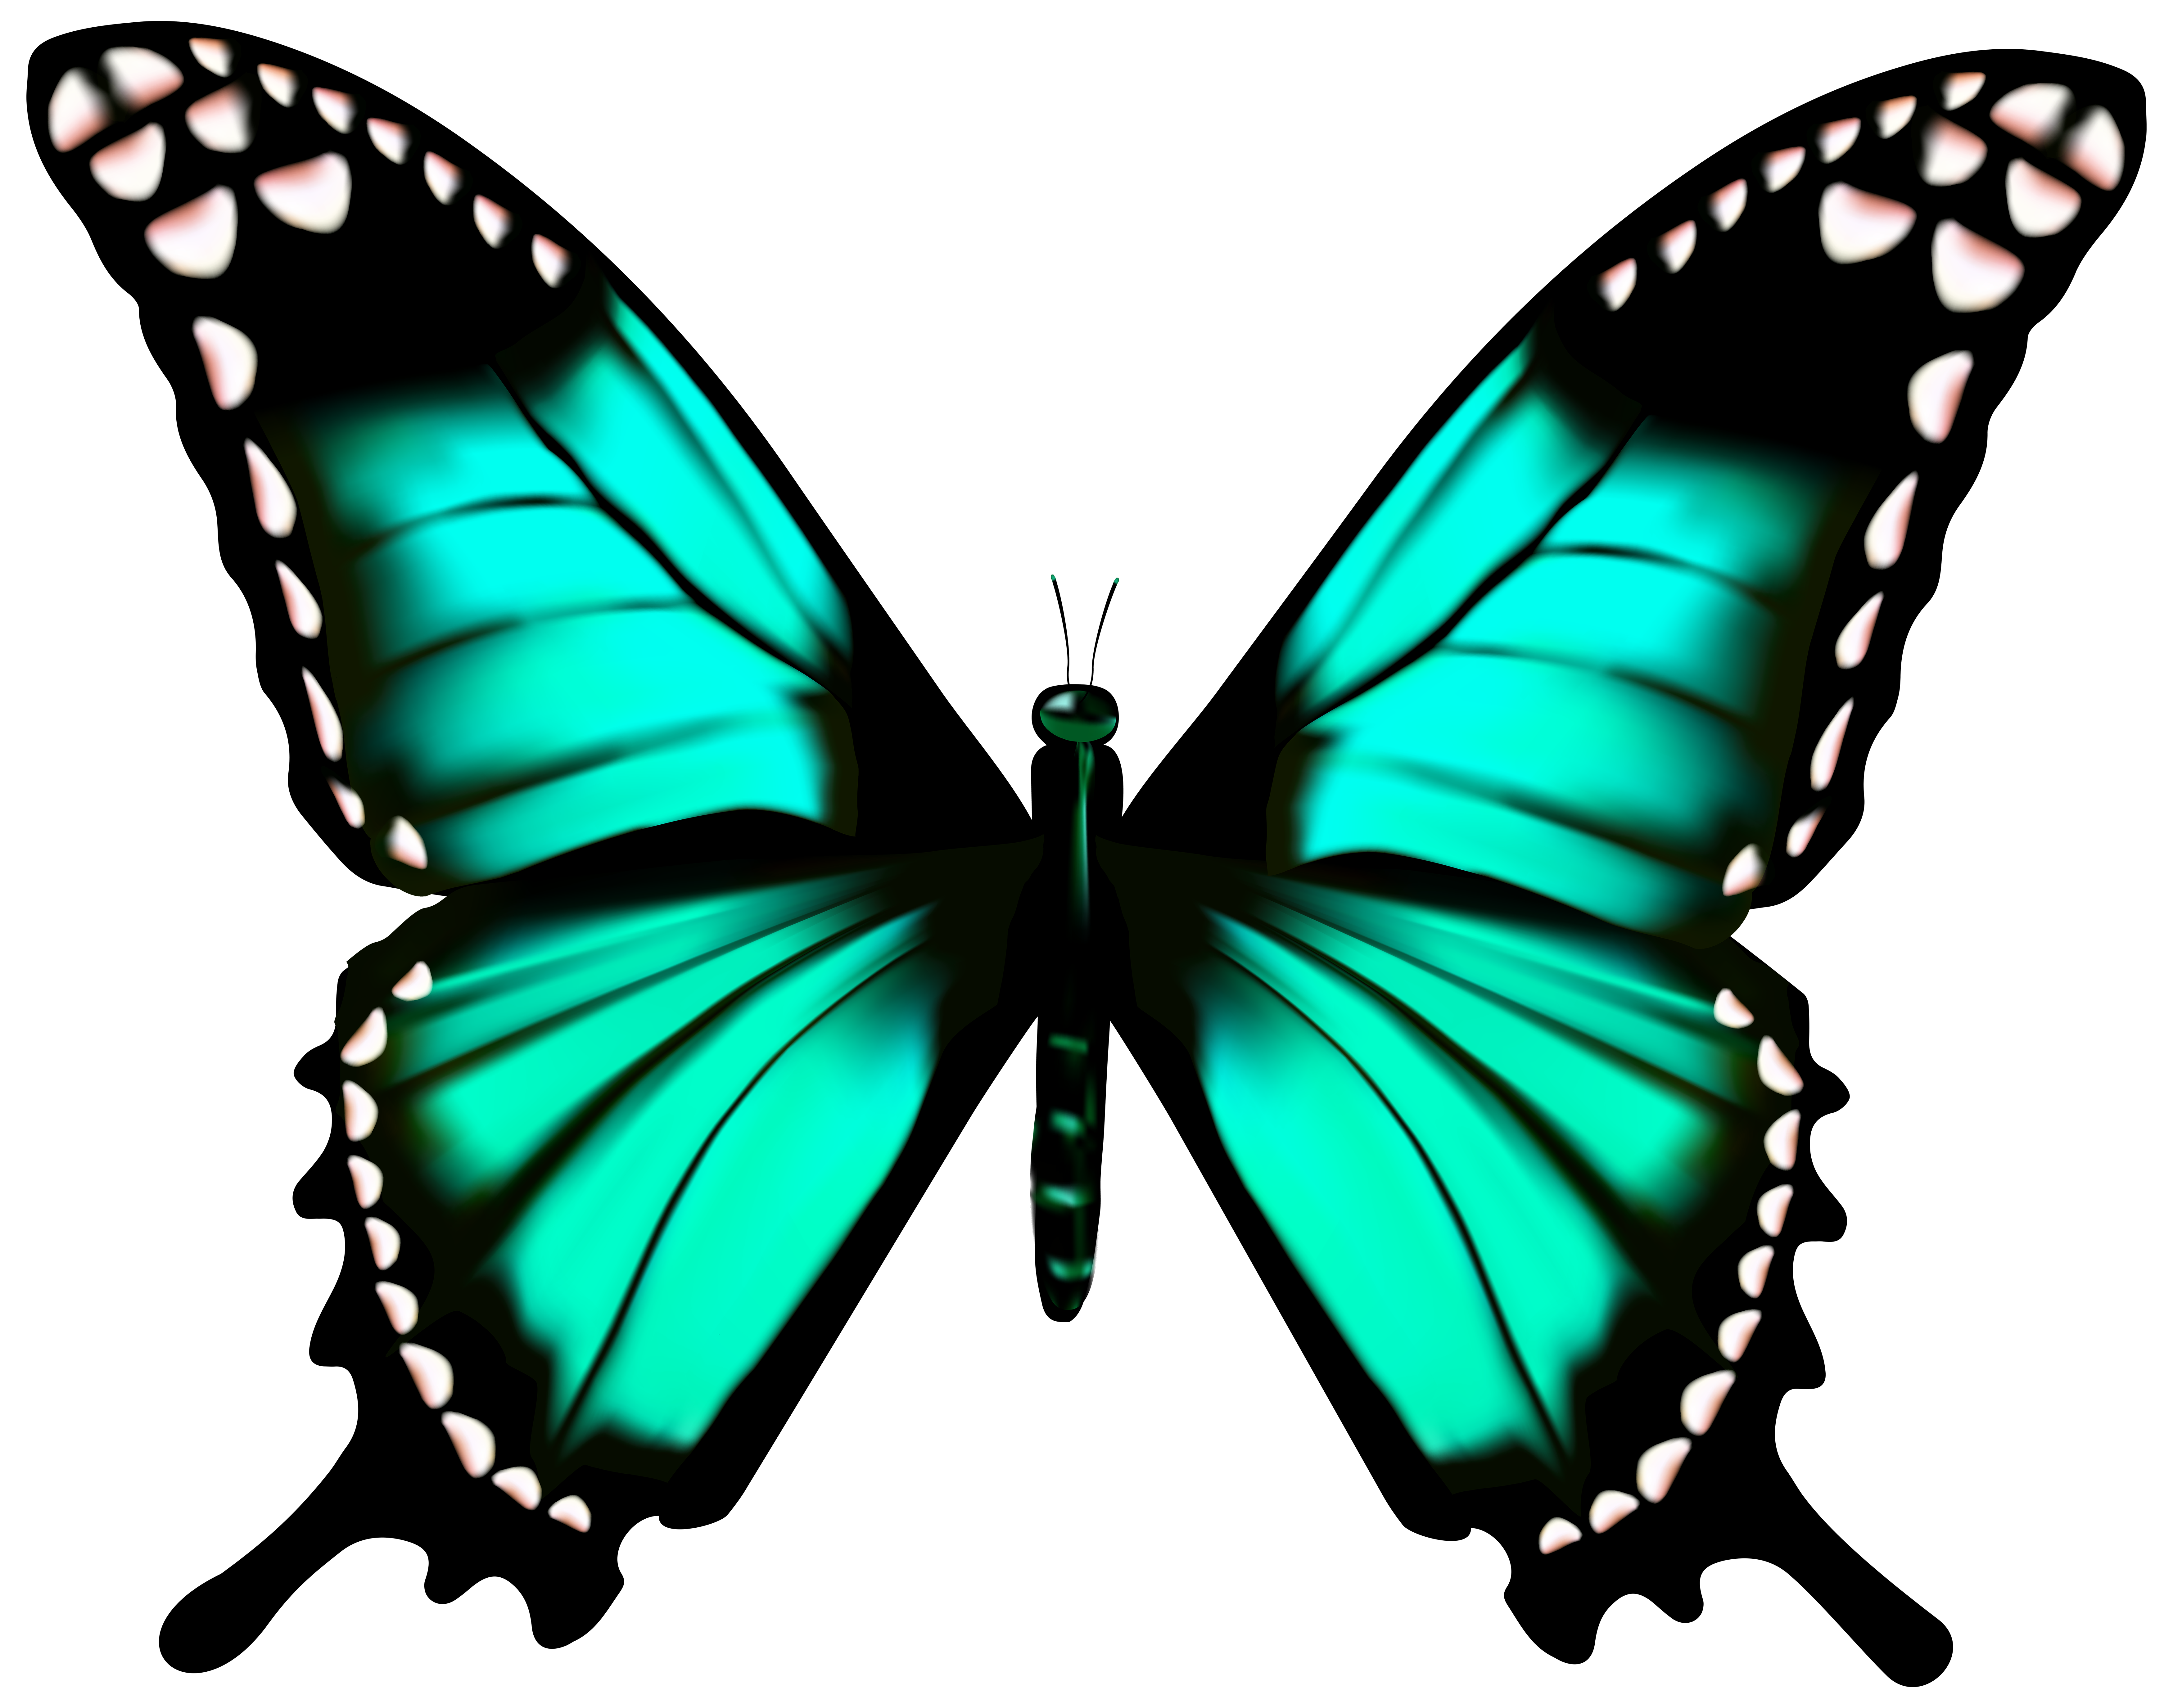 7000x5503 Butterfly Transparent Png Clip Art Imageu200b Gallery Yopriceville